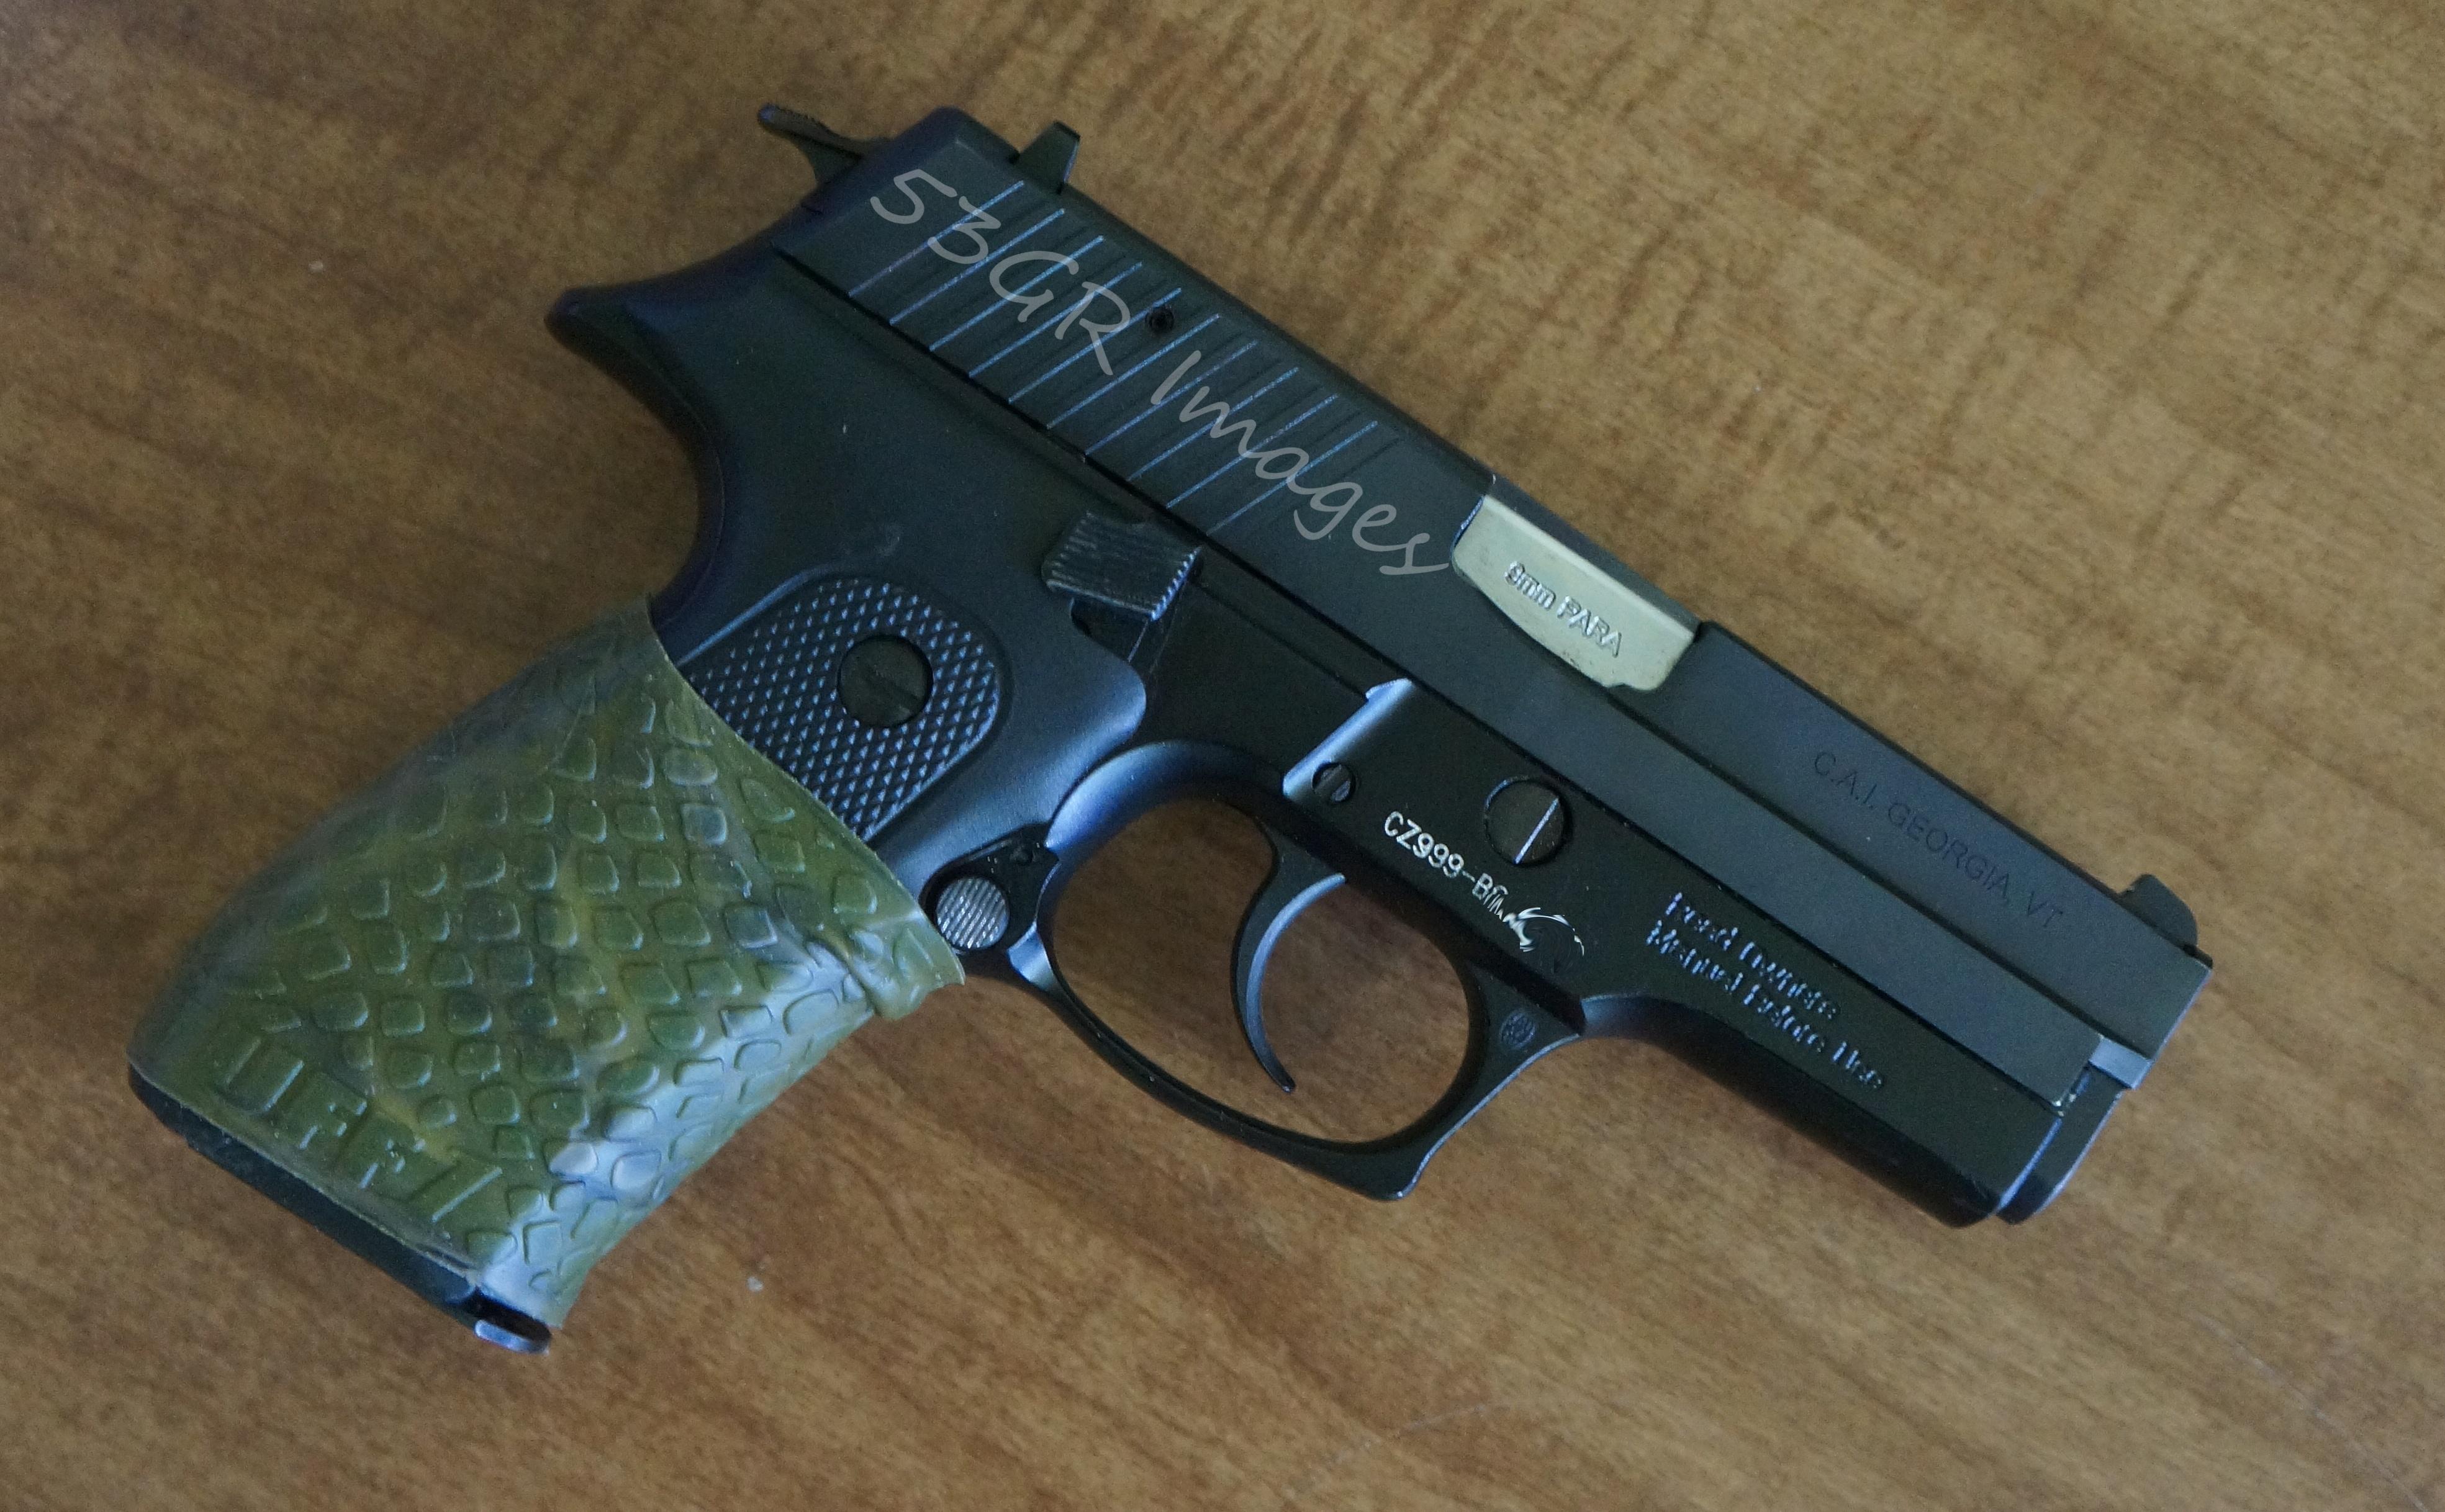 Zastava CZ999 Compact 9mm pistol